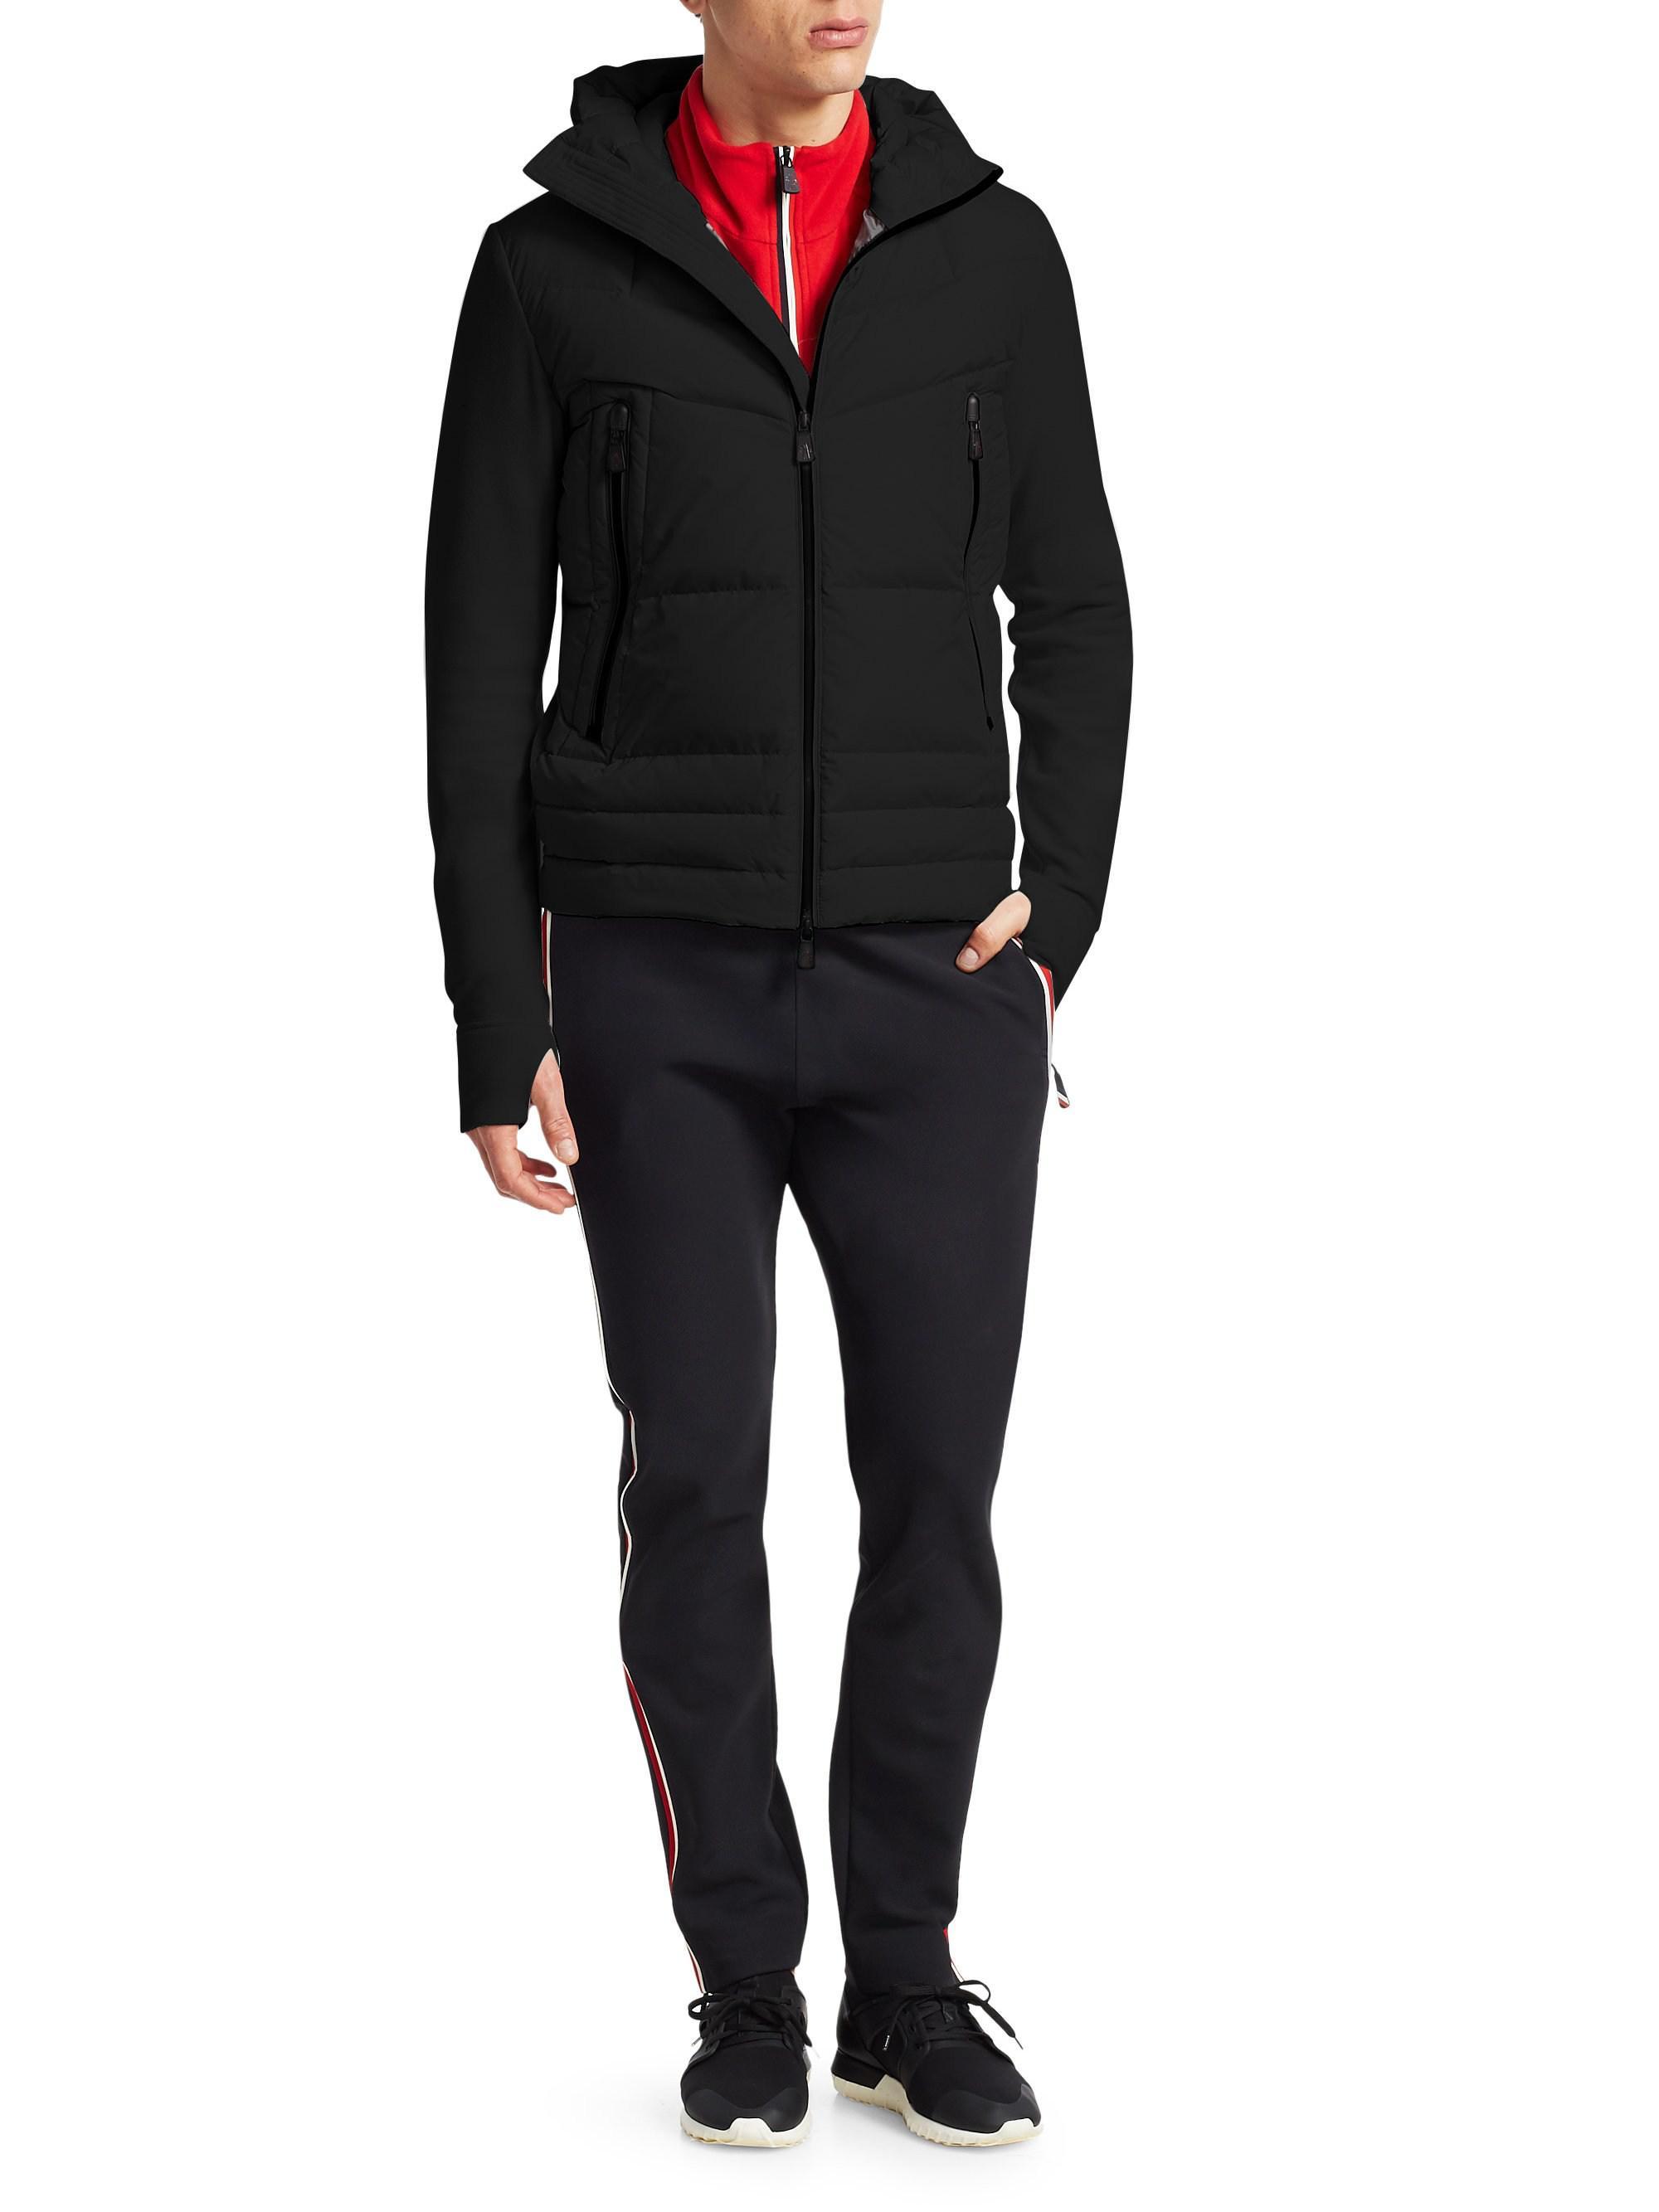 99b1a9173 Lyst - Moncler Hooded Fleece Down Jacket in Black for Men